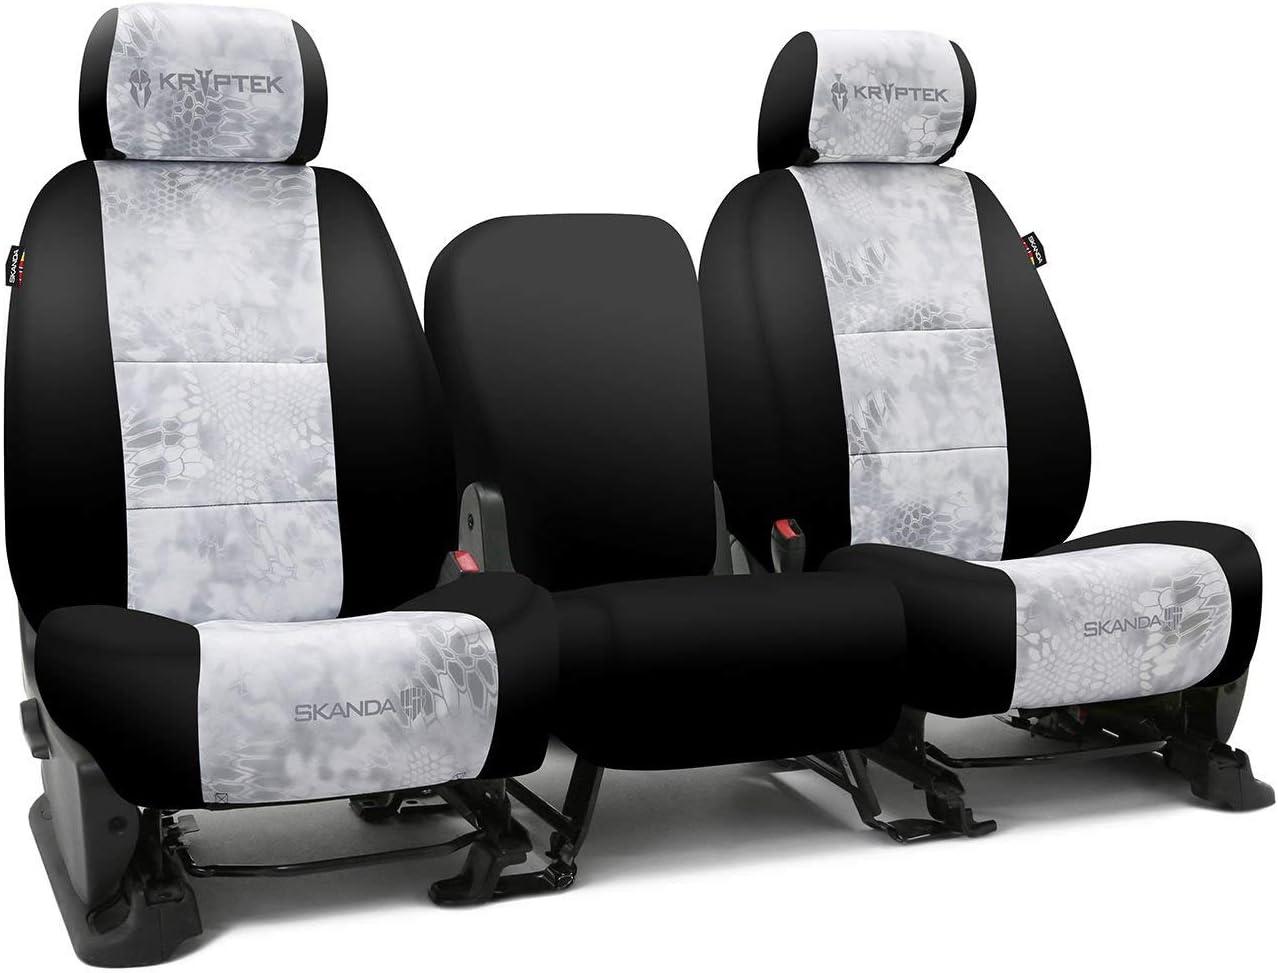 Rear SEAT: ShearComfort Custom Kryptek Covers Neo-Supreme Seat f Houston Now on sale Mall